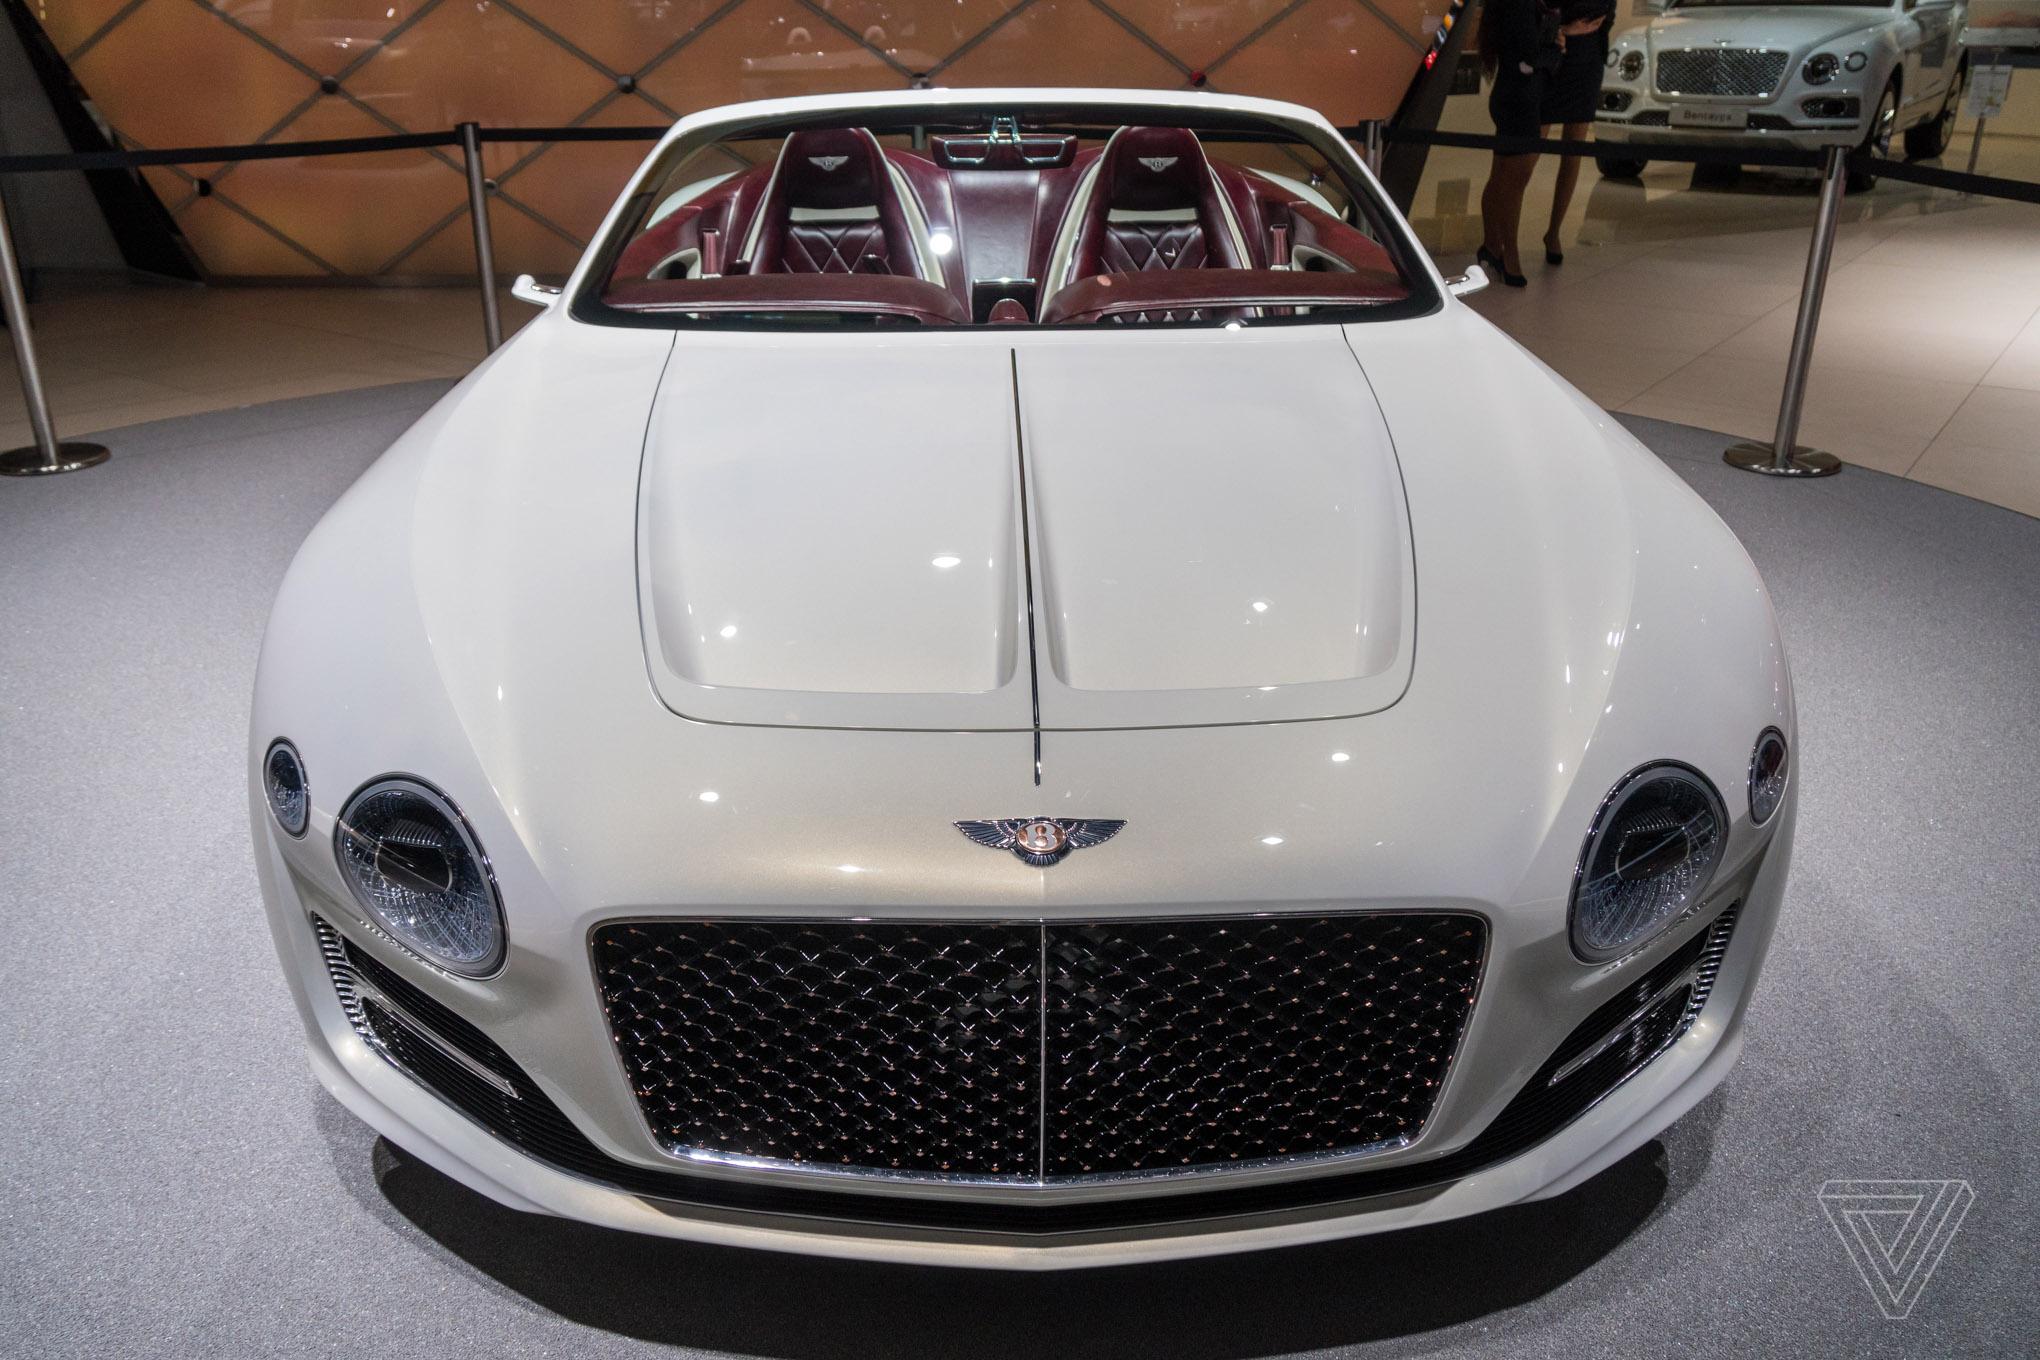 Bentley Electric Car Concept